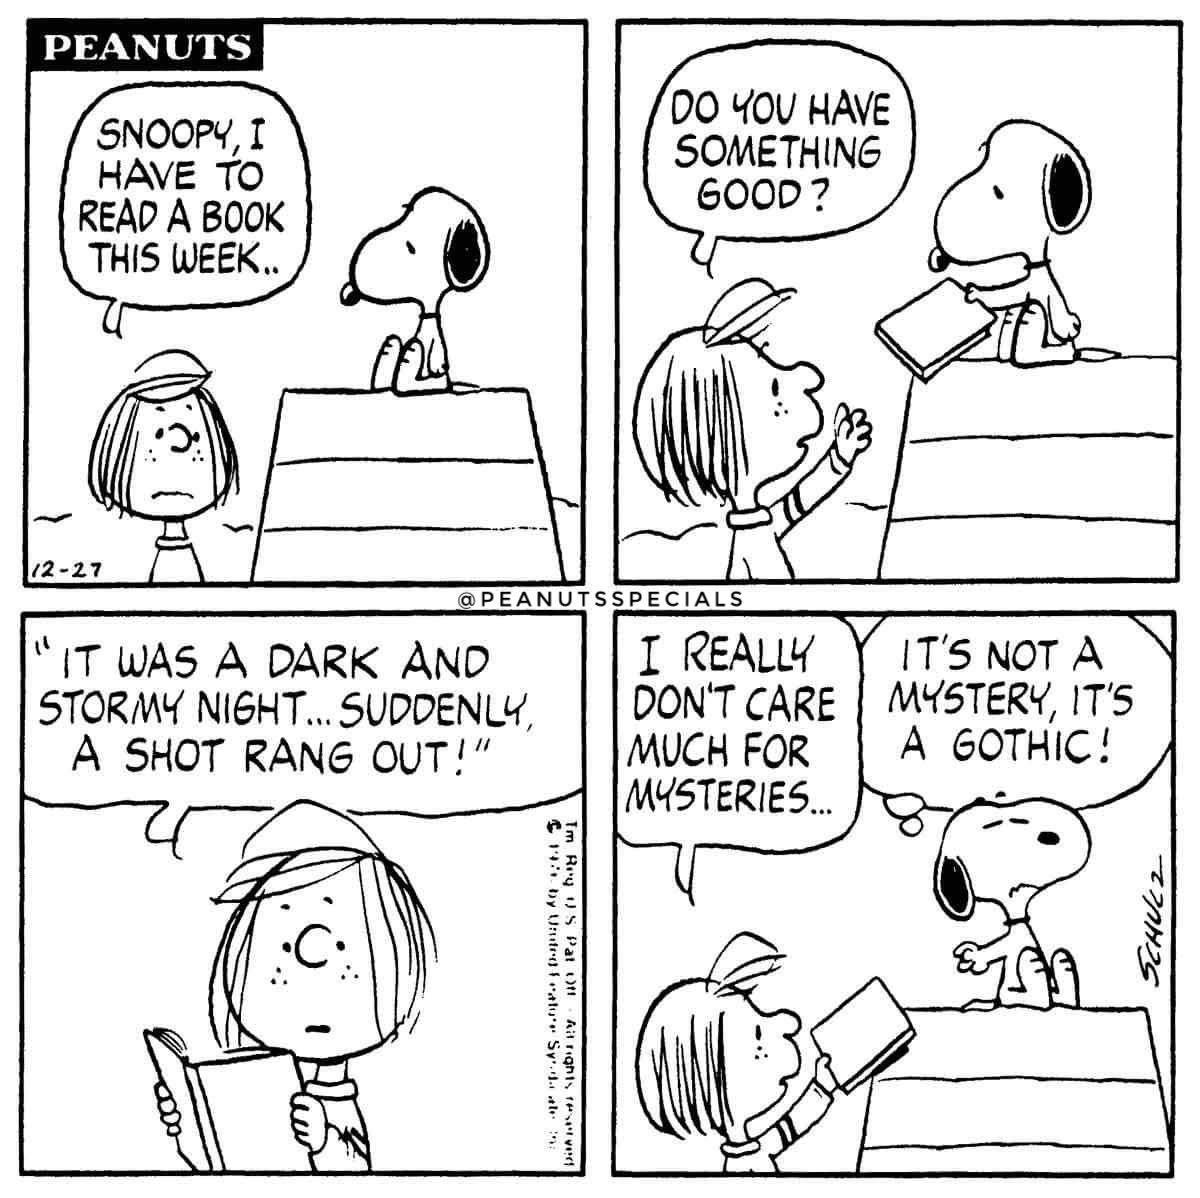 3eea16f38bae Peanutsspecials peanuts schulz snoopy peppermintpatty read book week good  mysteries jpg 1200x1198 Snoopy goth